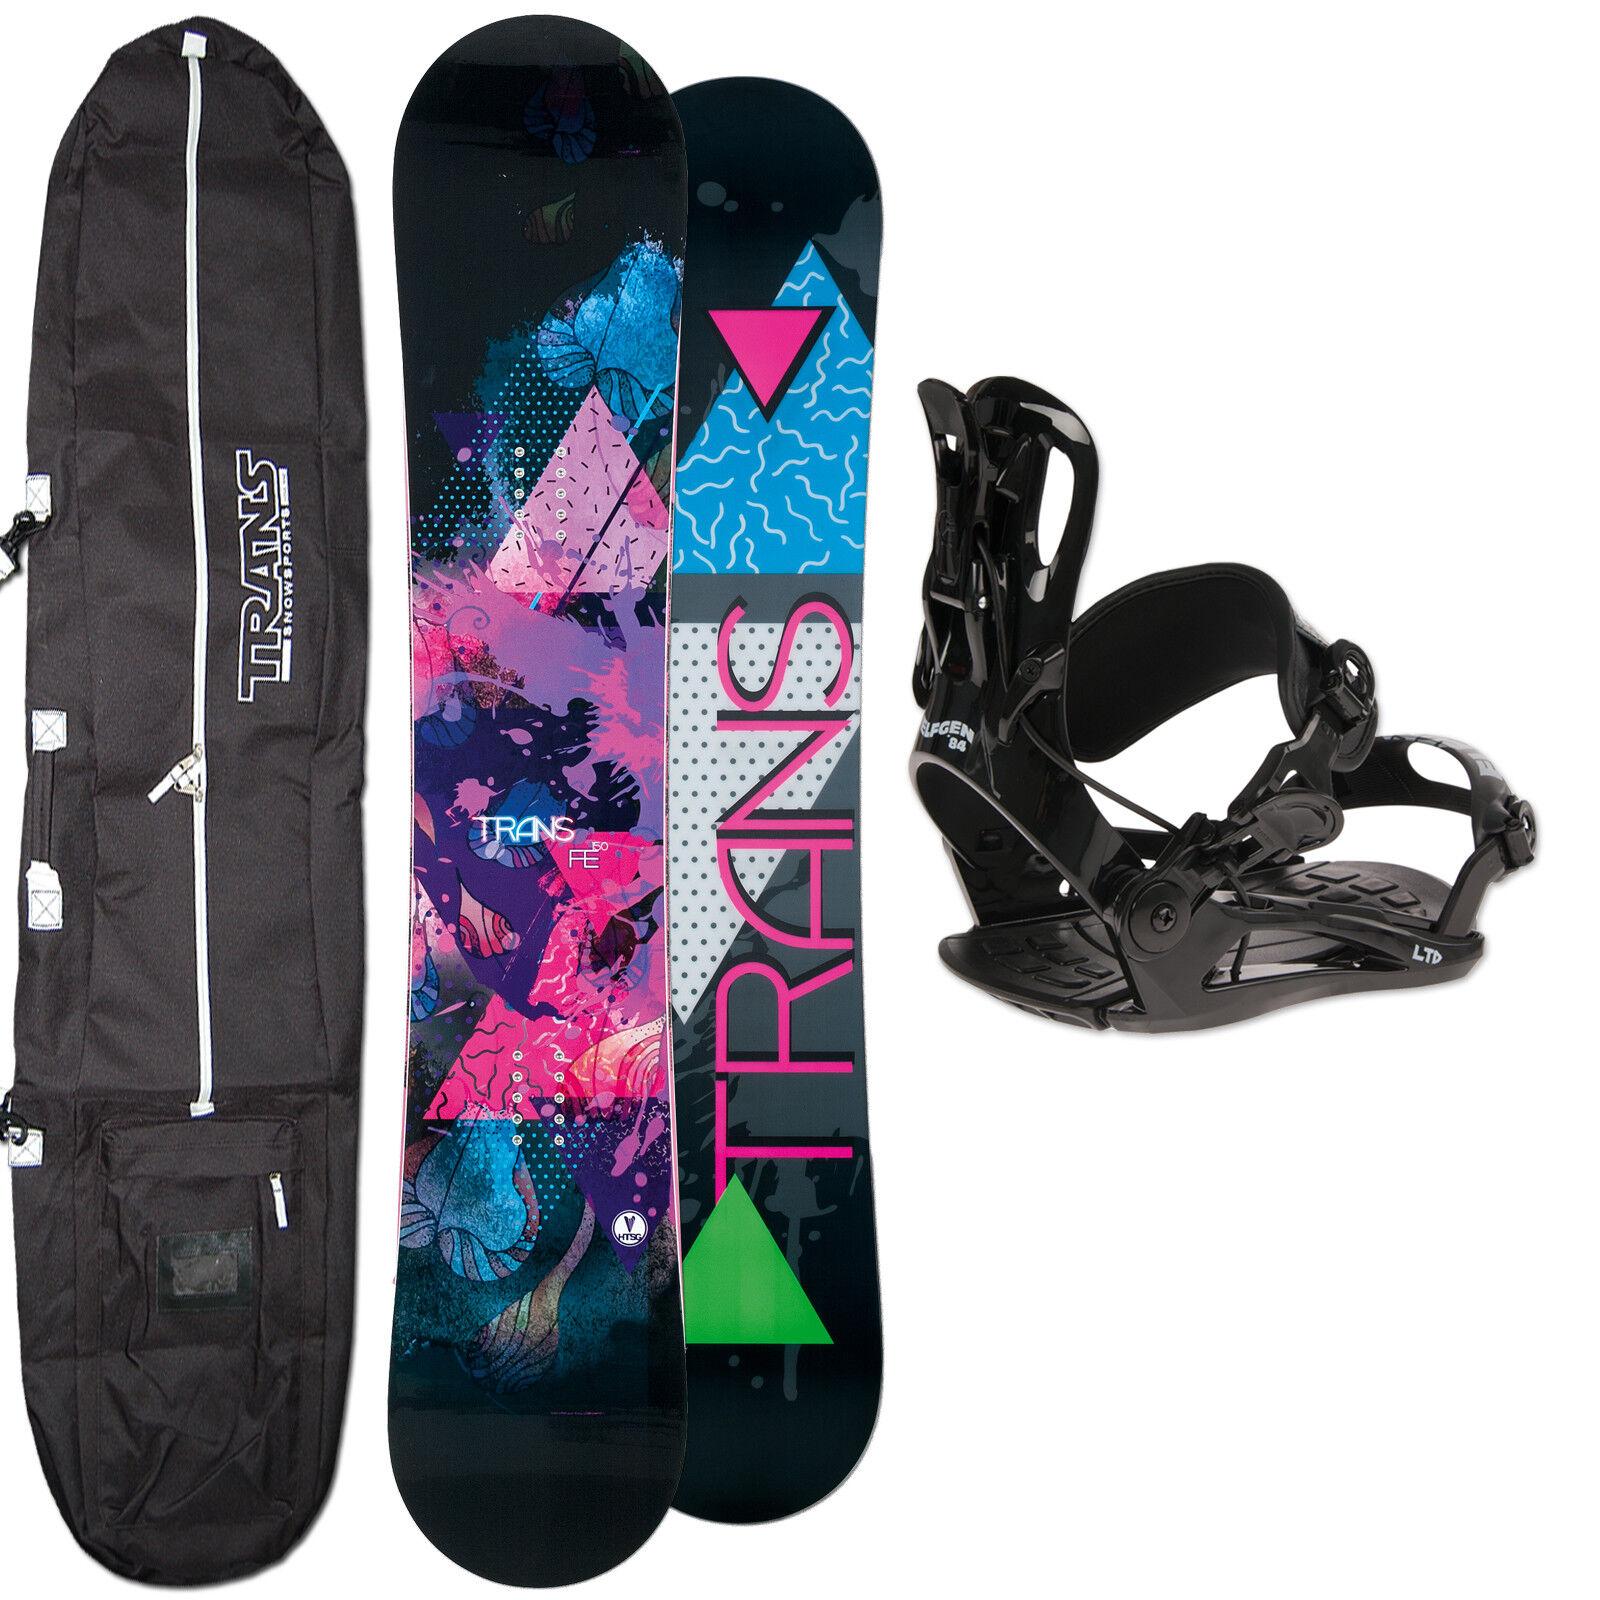 Snowboard Mujer Trans Fe Rocker 139cm + Fastec Fijación Talla S + Board Bag